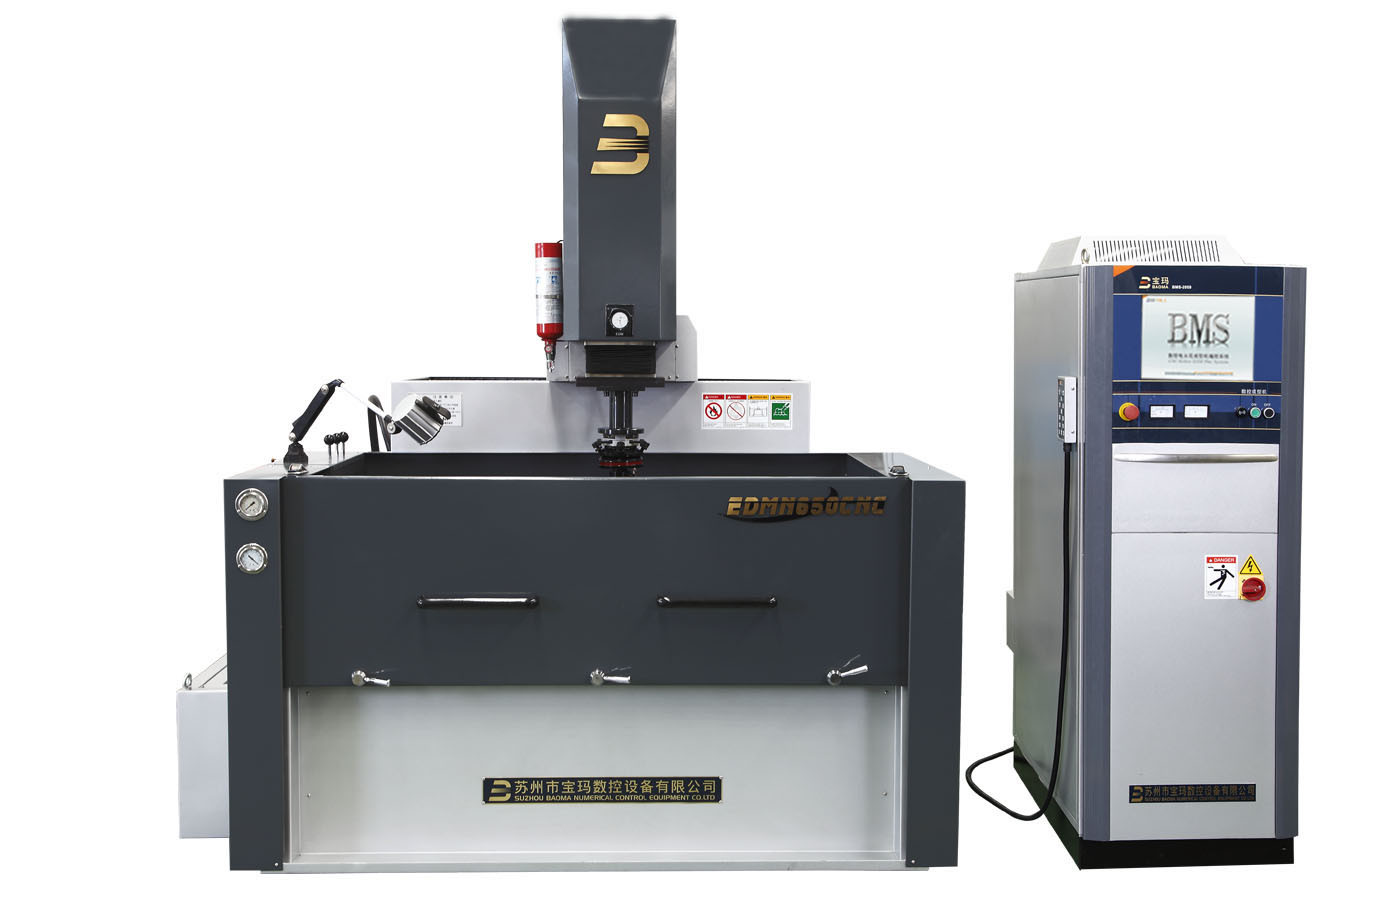 CNC Sinker EDM (EDMN650CNC)